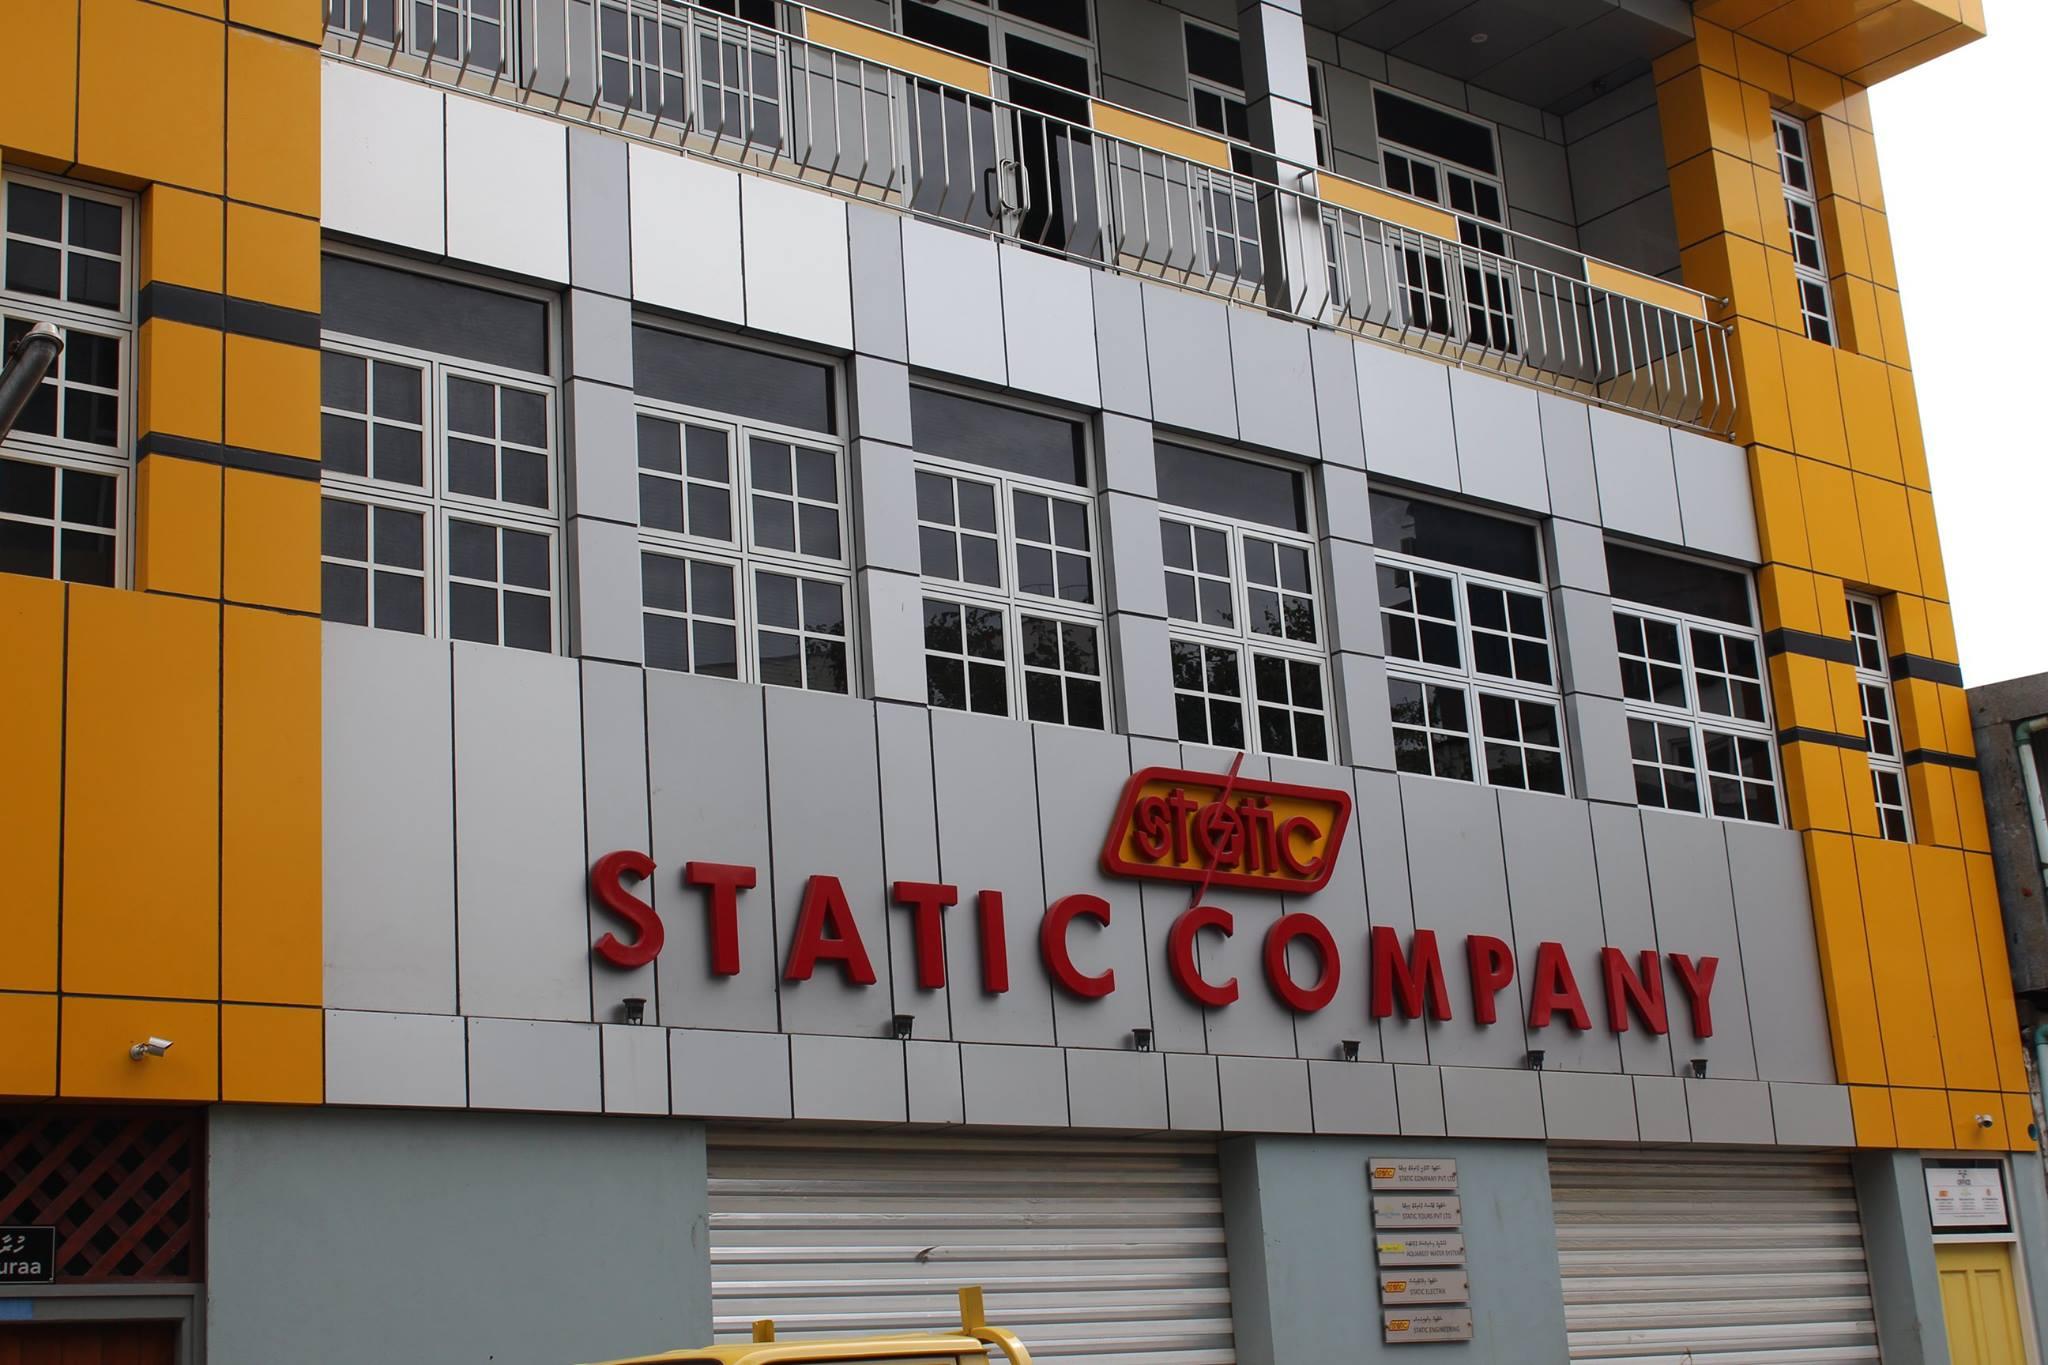 Static Company Cladding work